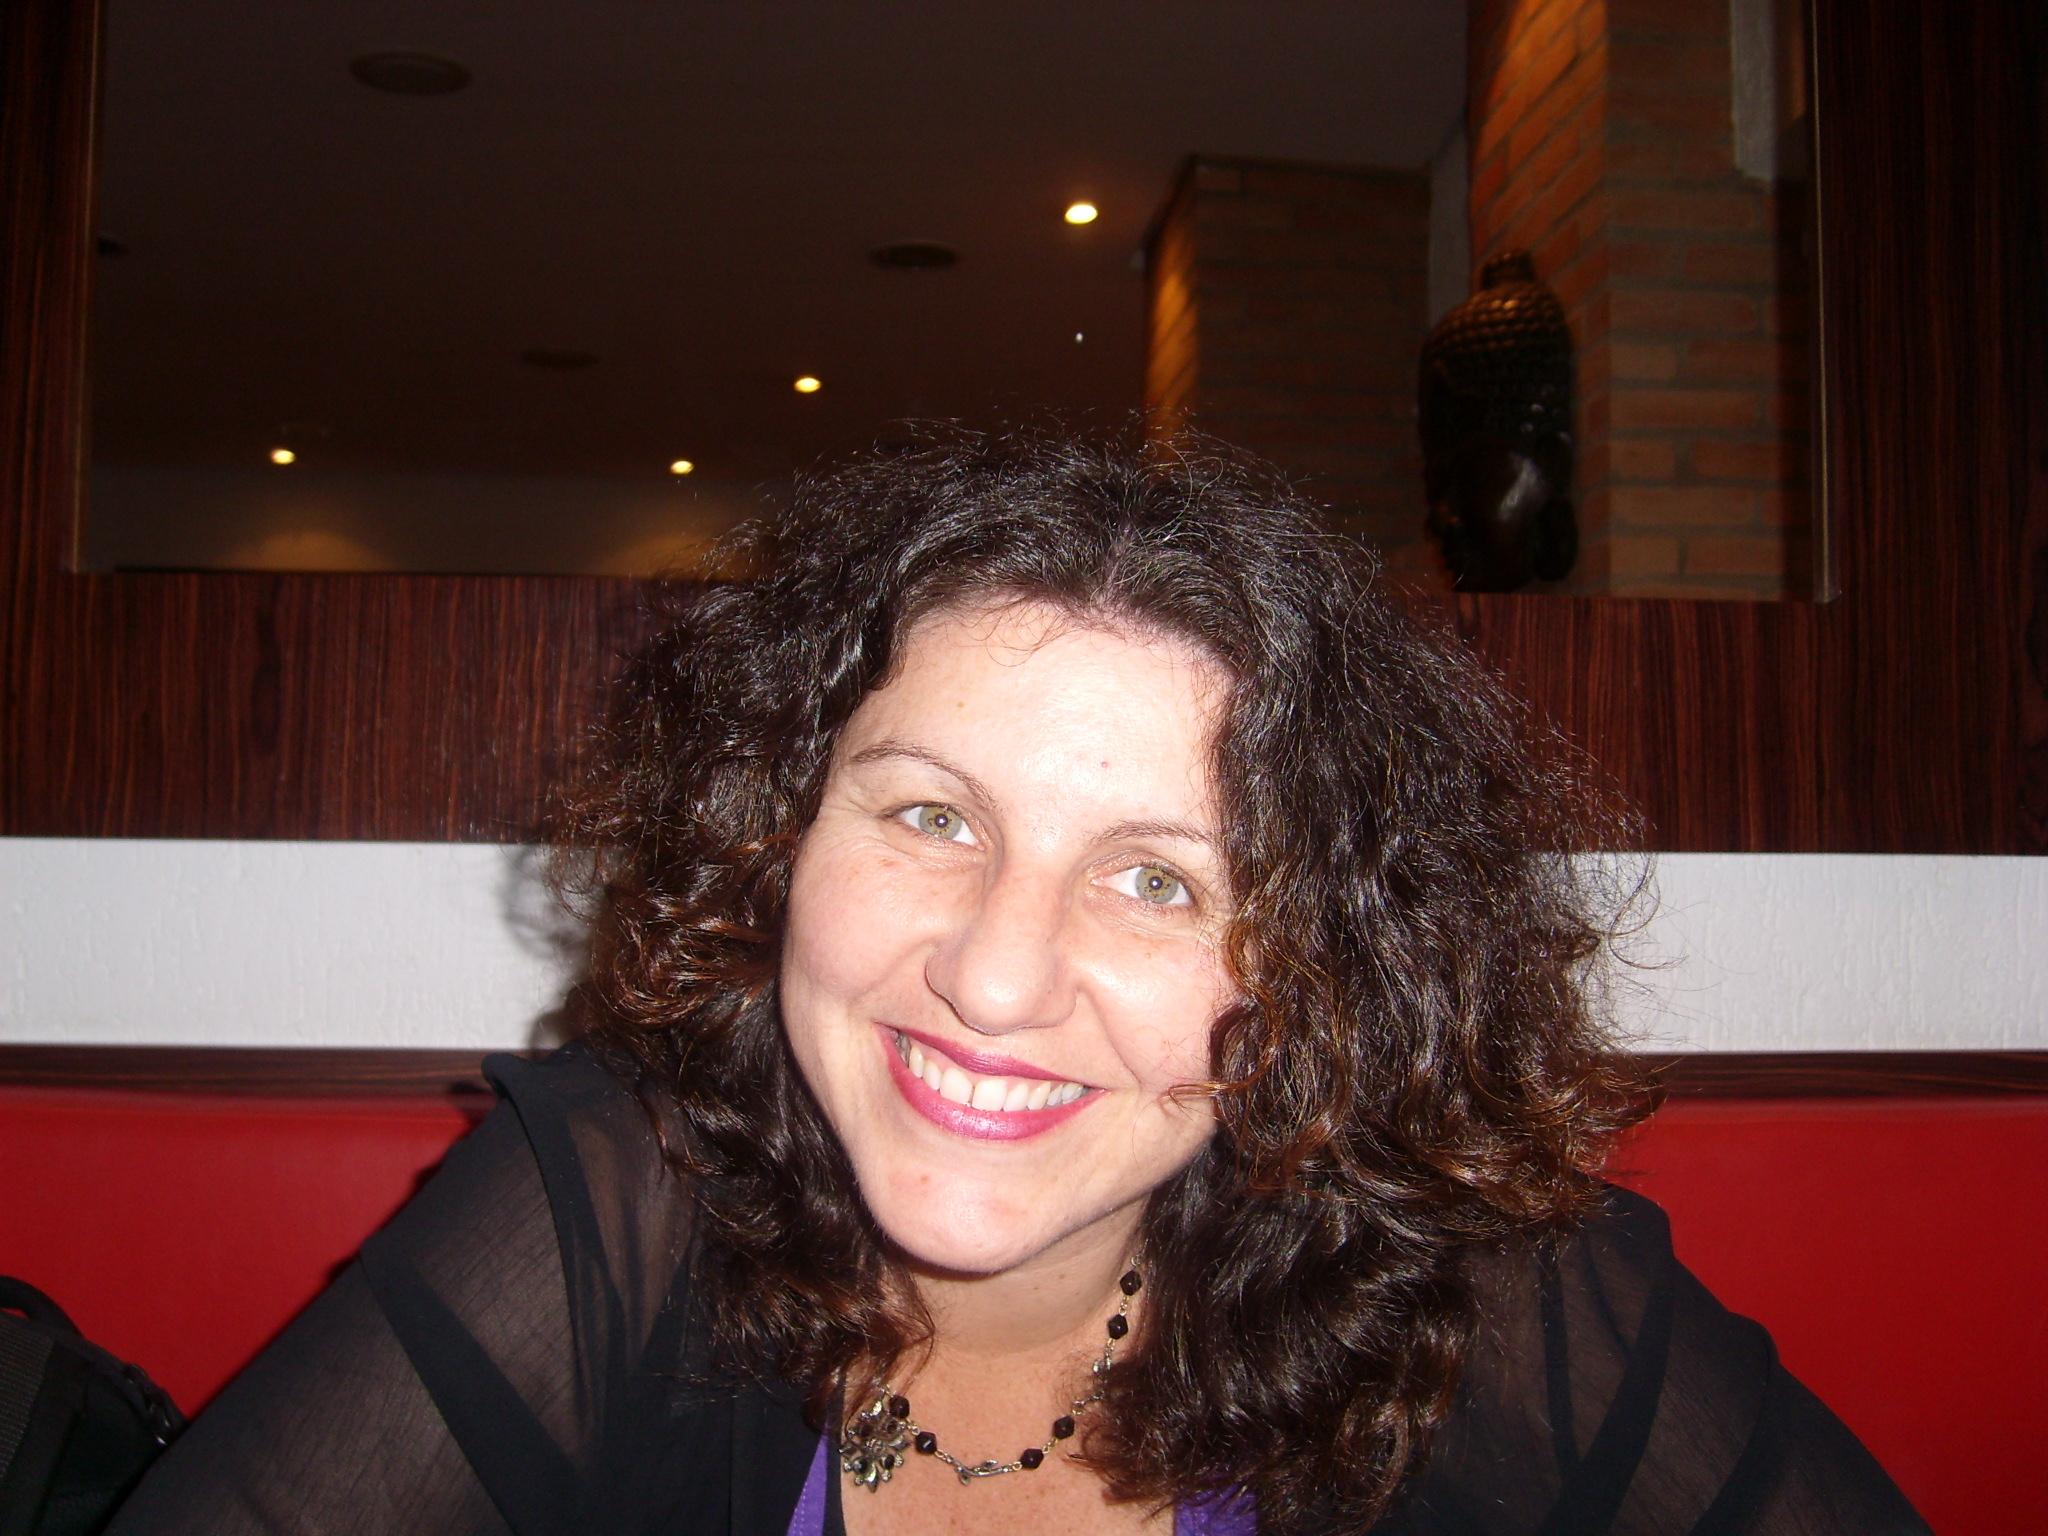 Giselle Guilhon Antunes Camargo